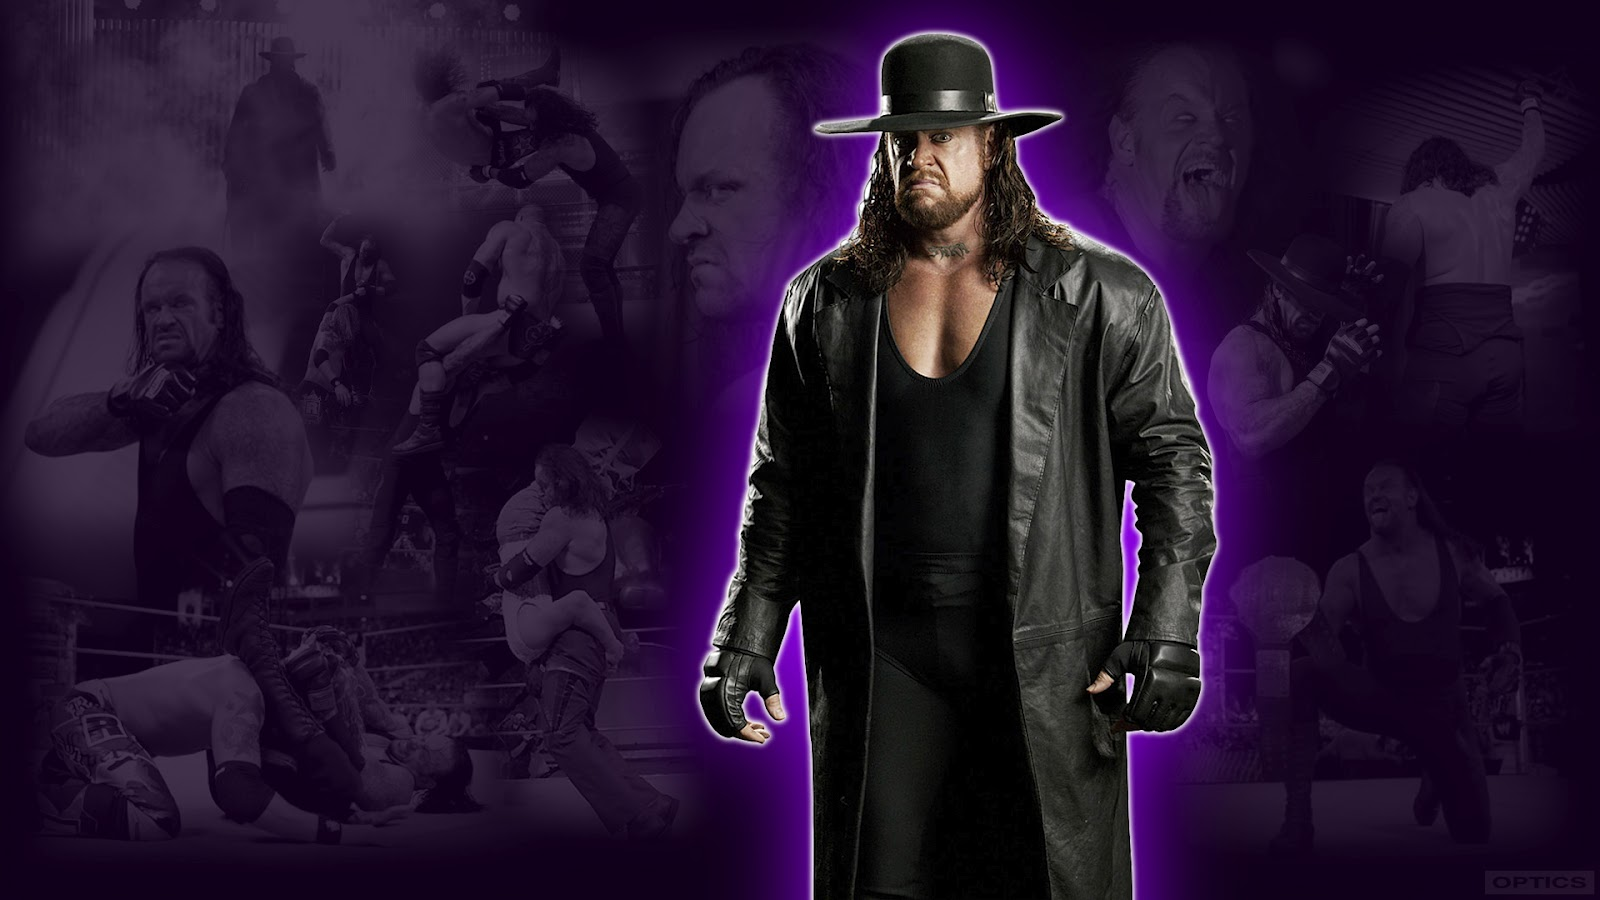 undertaker wallpaper the undertaker wallpaper the undertaker wallpaper    Undertaker Wallpaper 2012